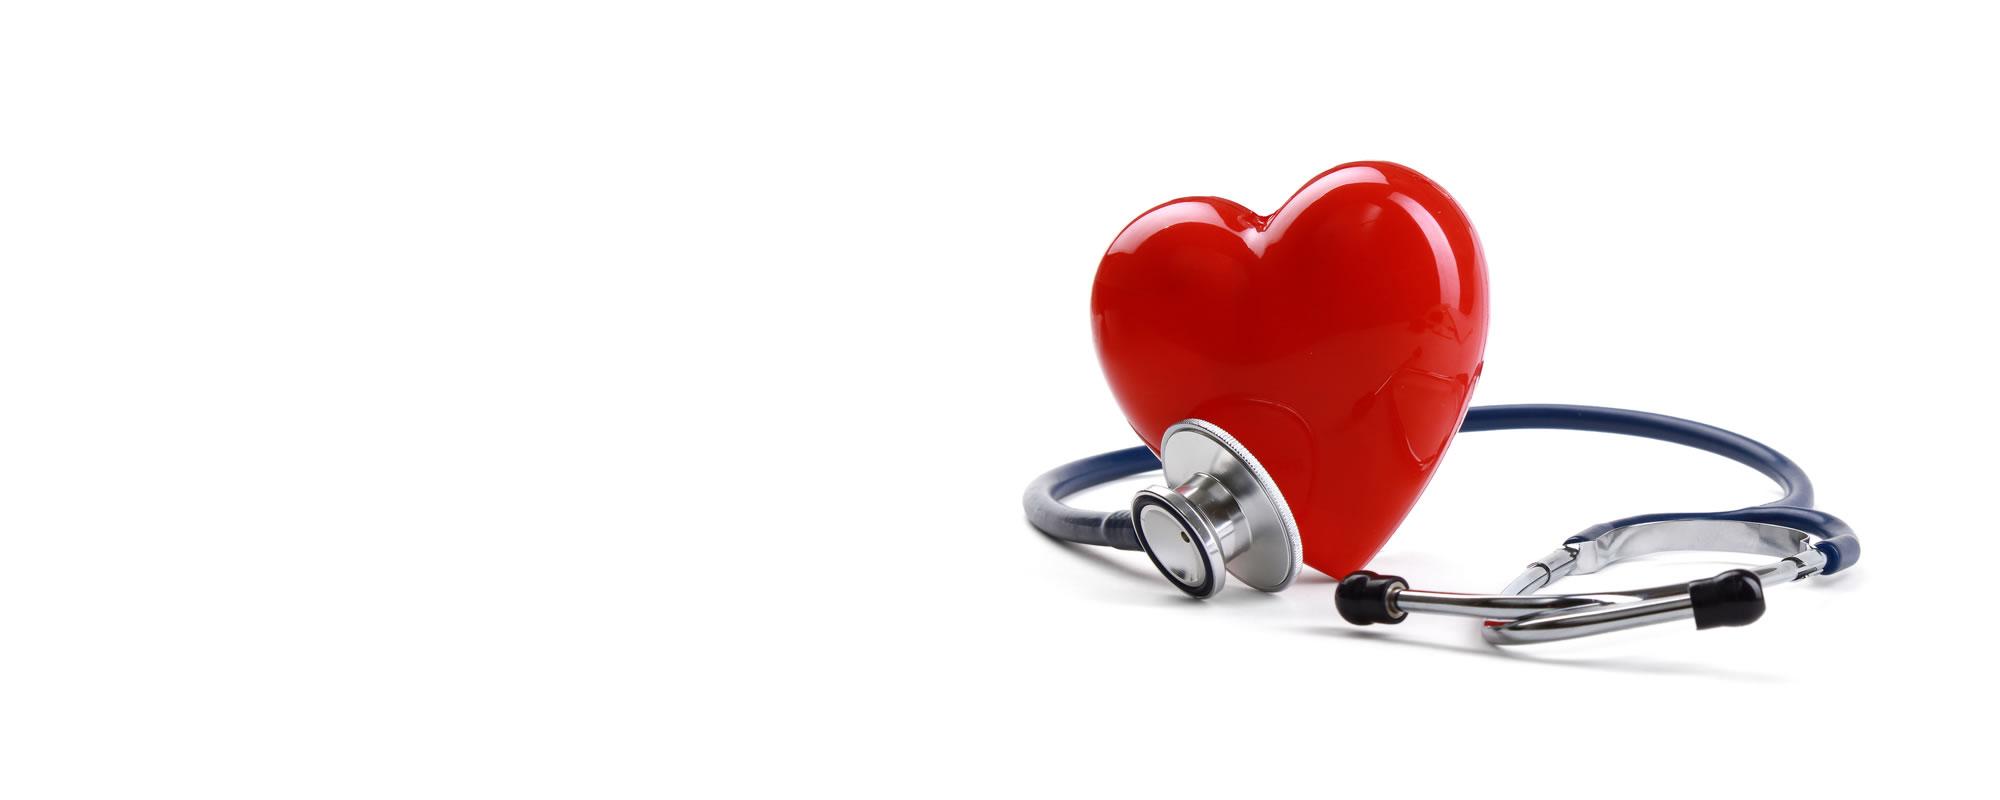 <span>Ati fost diagnosticat cu o boala cardiovasculara?</span>